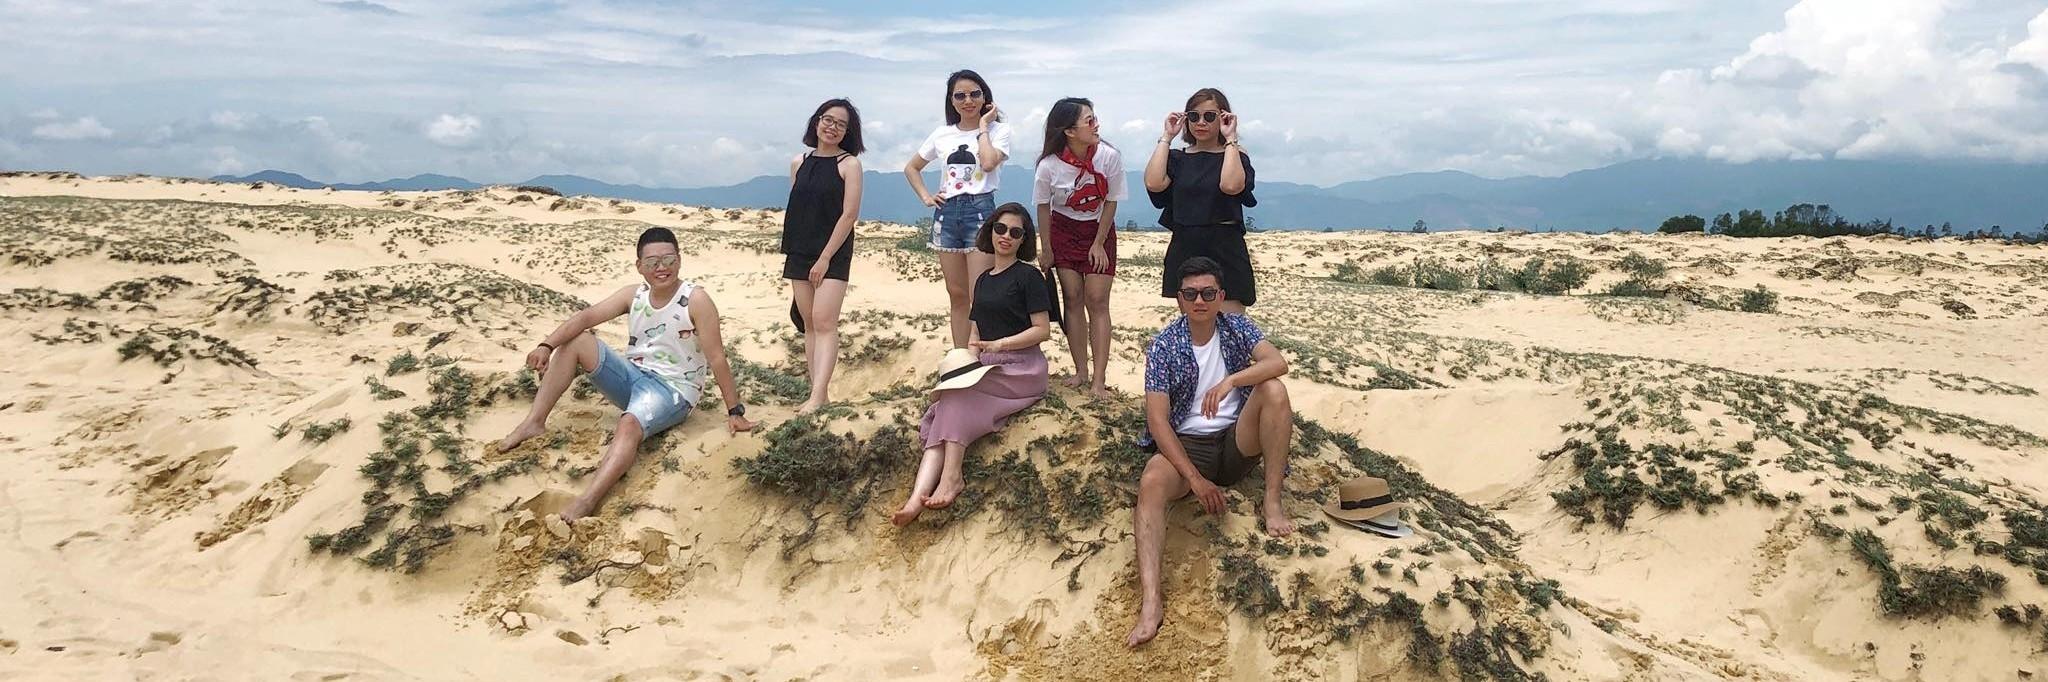 https://gody.vn/blog/ad3041/post/huong-dan-dang-ky-va-thiet-lap-trang-travel-blog-ca-nhan-67